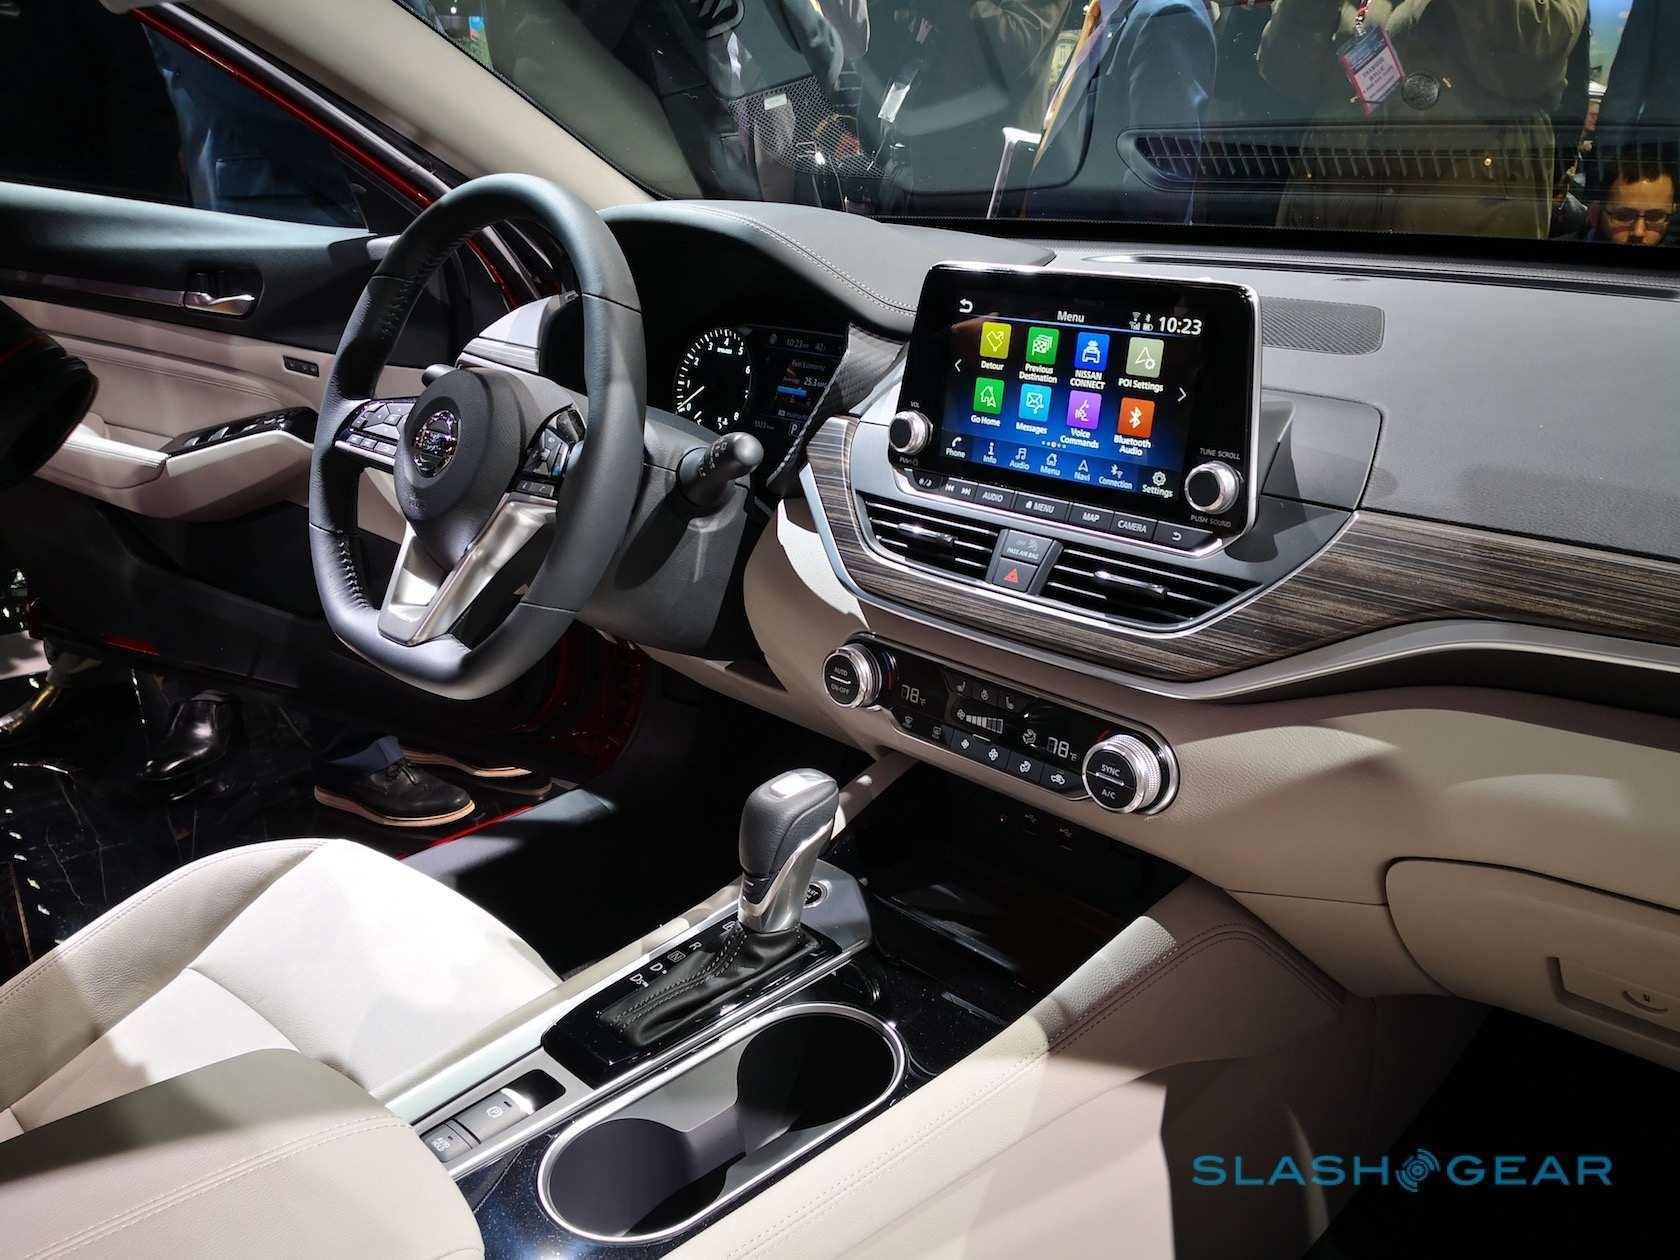 43 Concept of The 2019 Nissan Altima Interior Redesign And Concept Redesign and Concept with The 2019 Nissan Altima Interior Redesign And Concept